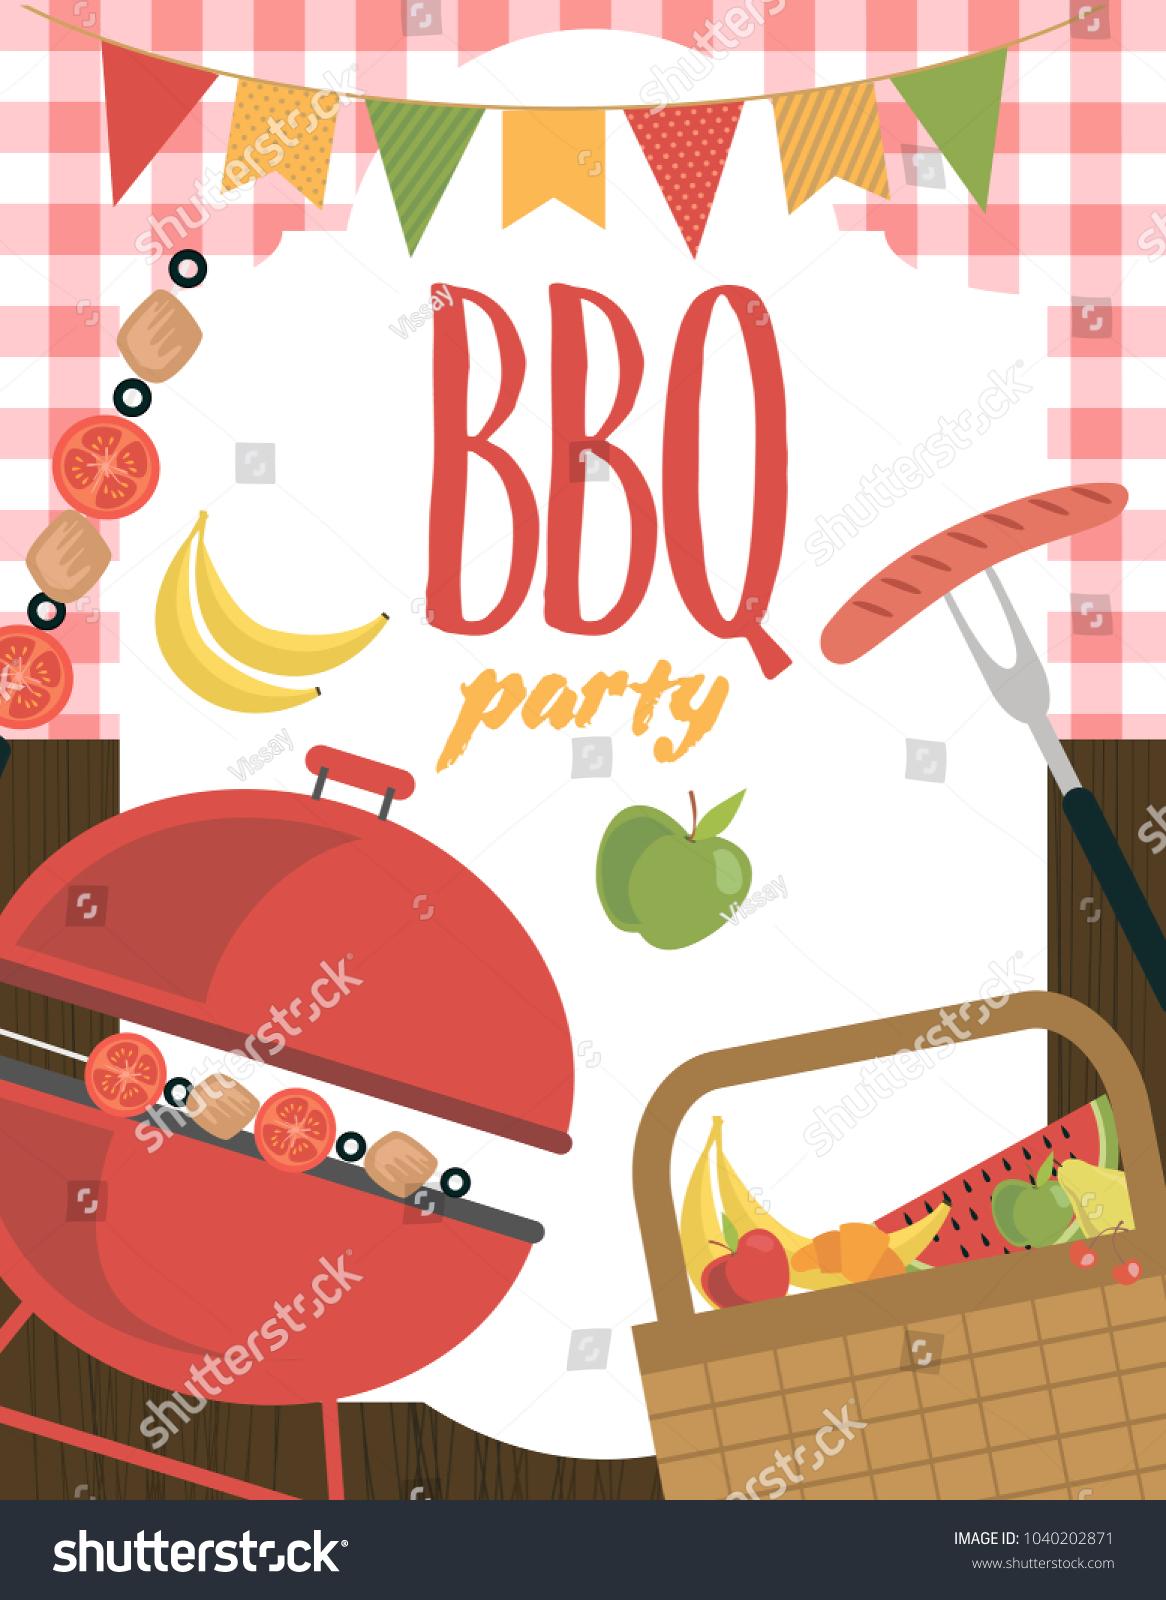 Picnic Barbecue Party Invitation Card Vector Stock Vector (Royalty ...